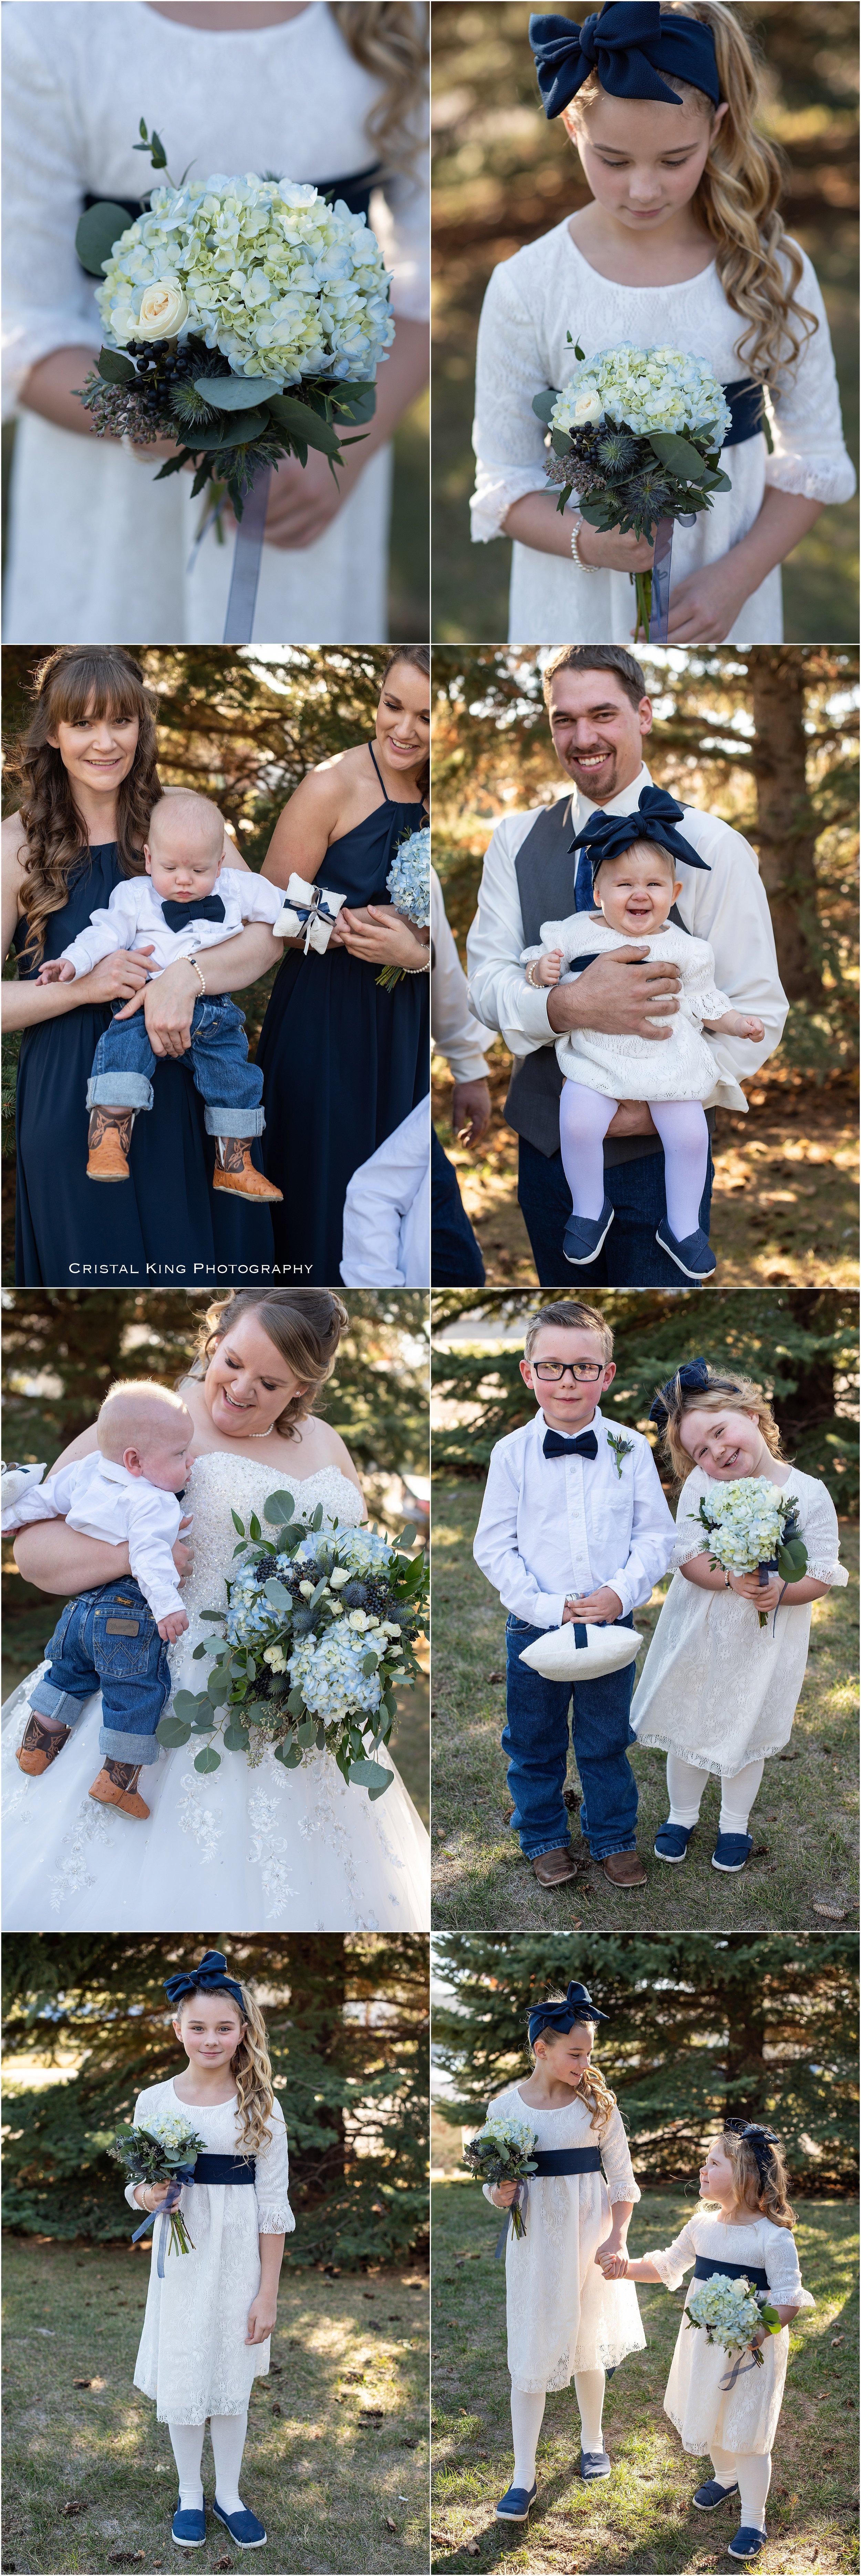 Tracy-Kyles-Wedding-61.jpg